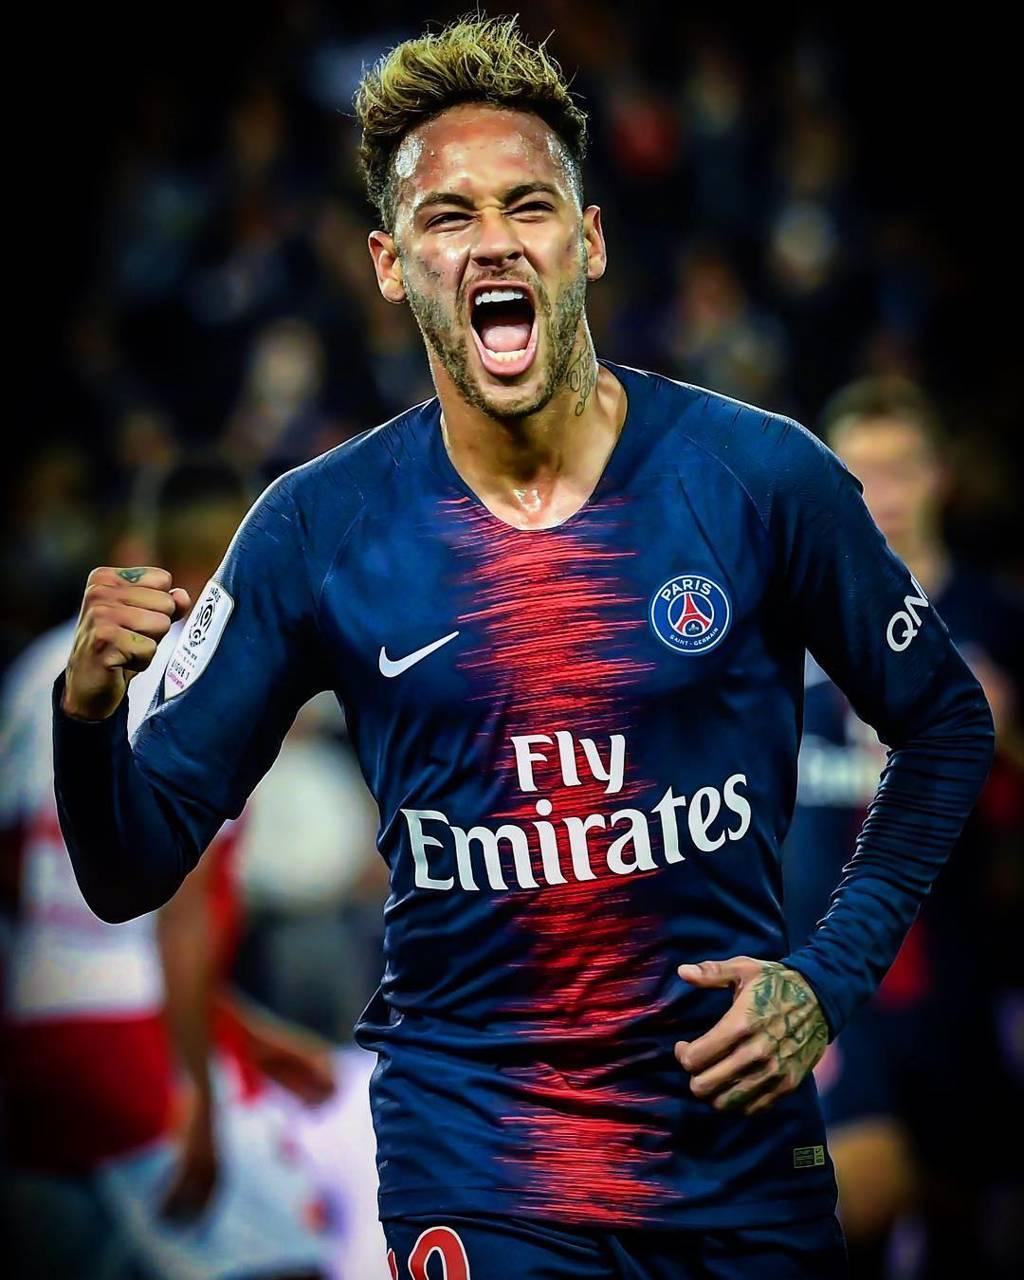 Neymar PSG 4k Mobile Wallpapers - Wallpaper Cave